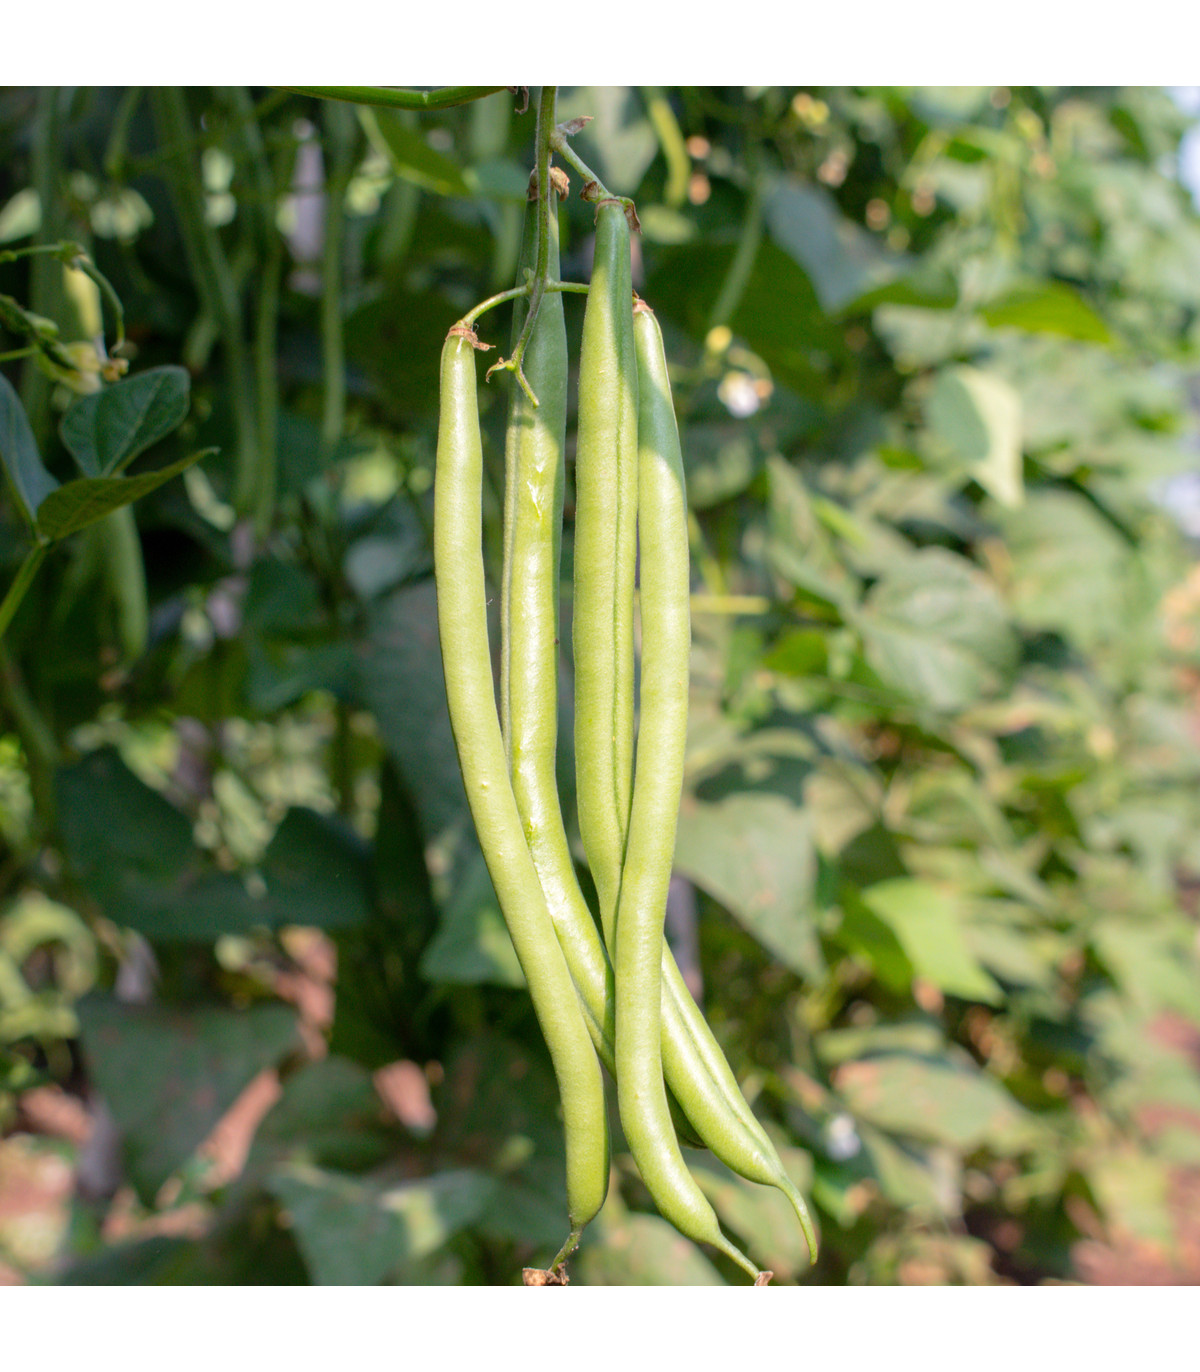 Semínka fazolů - Fazol keříčkový Dublette - prodej semen - 8 ks